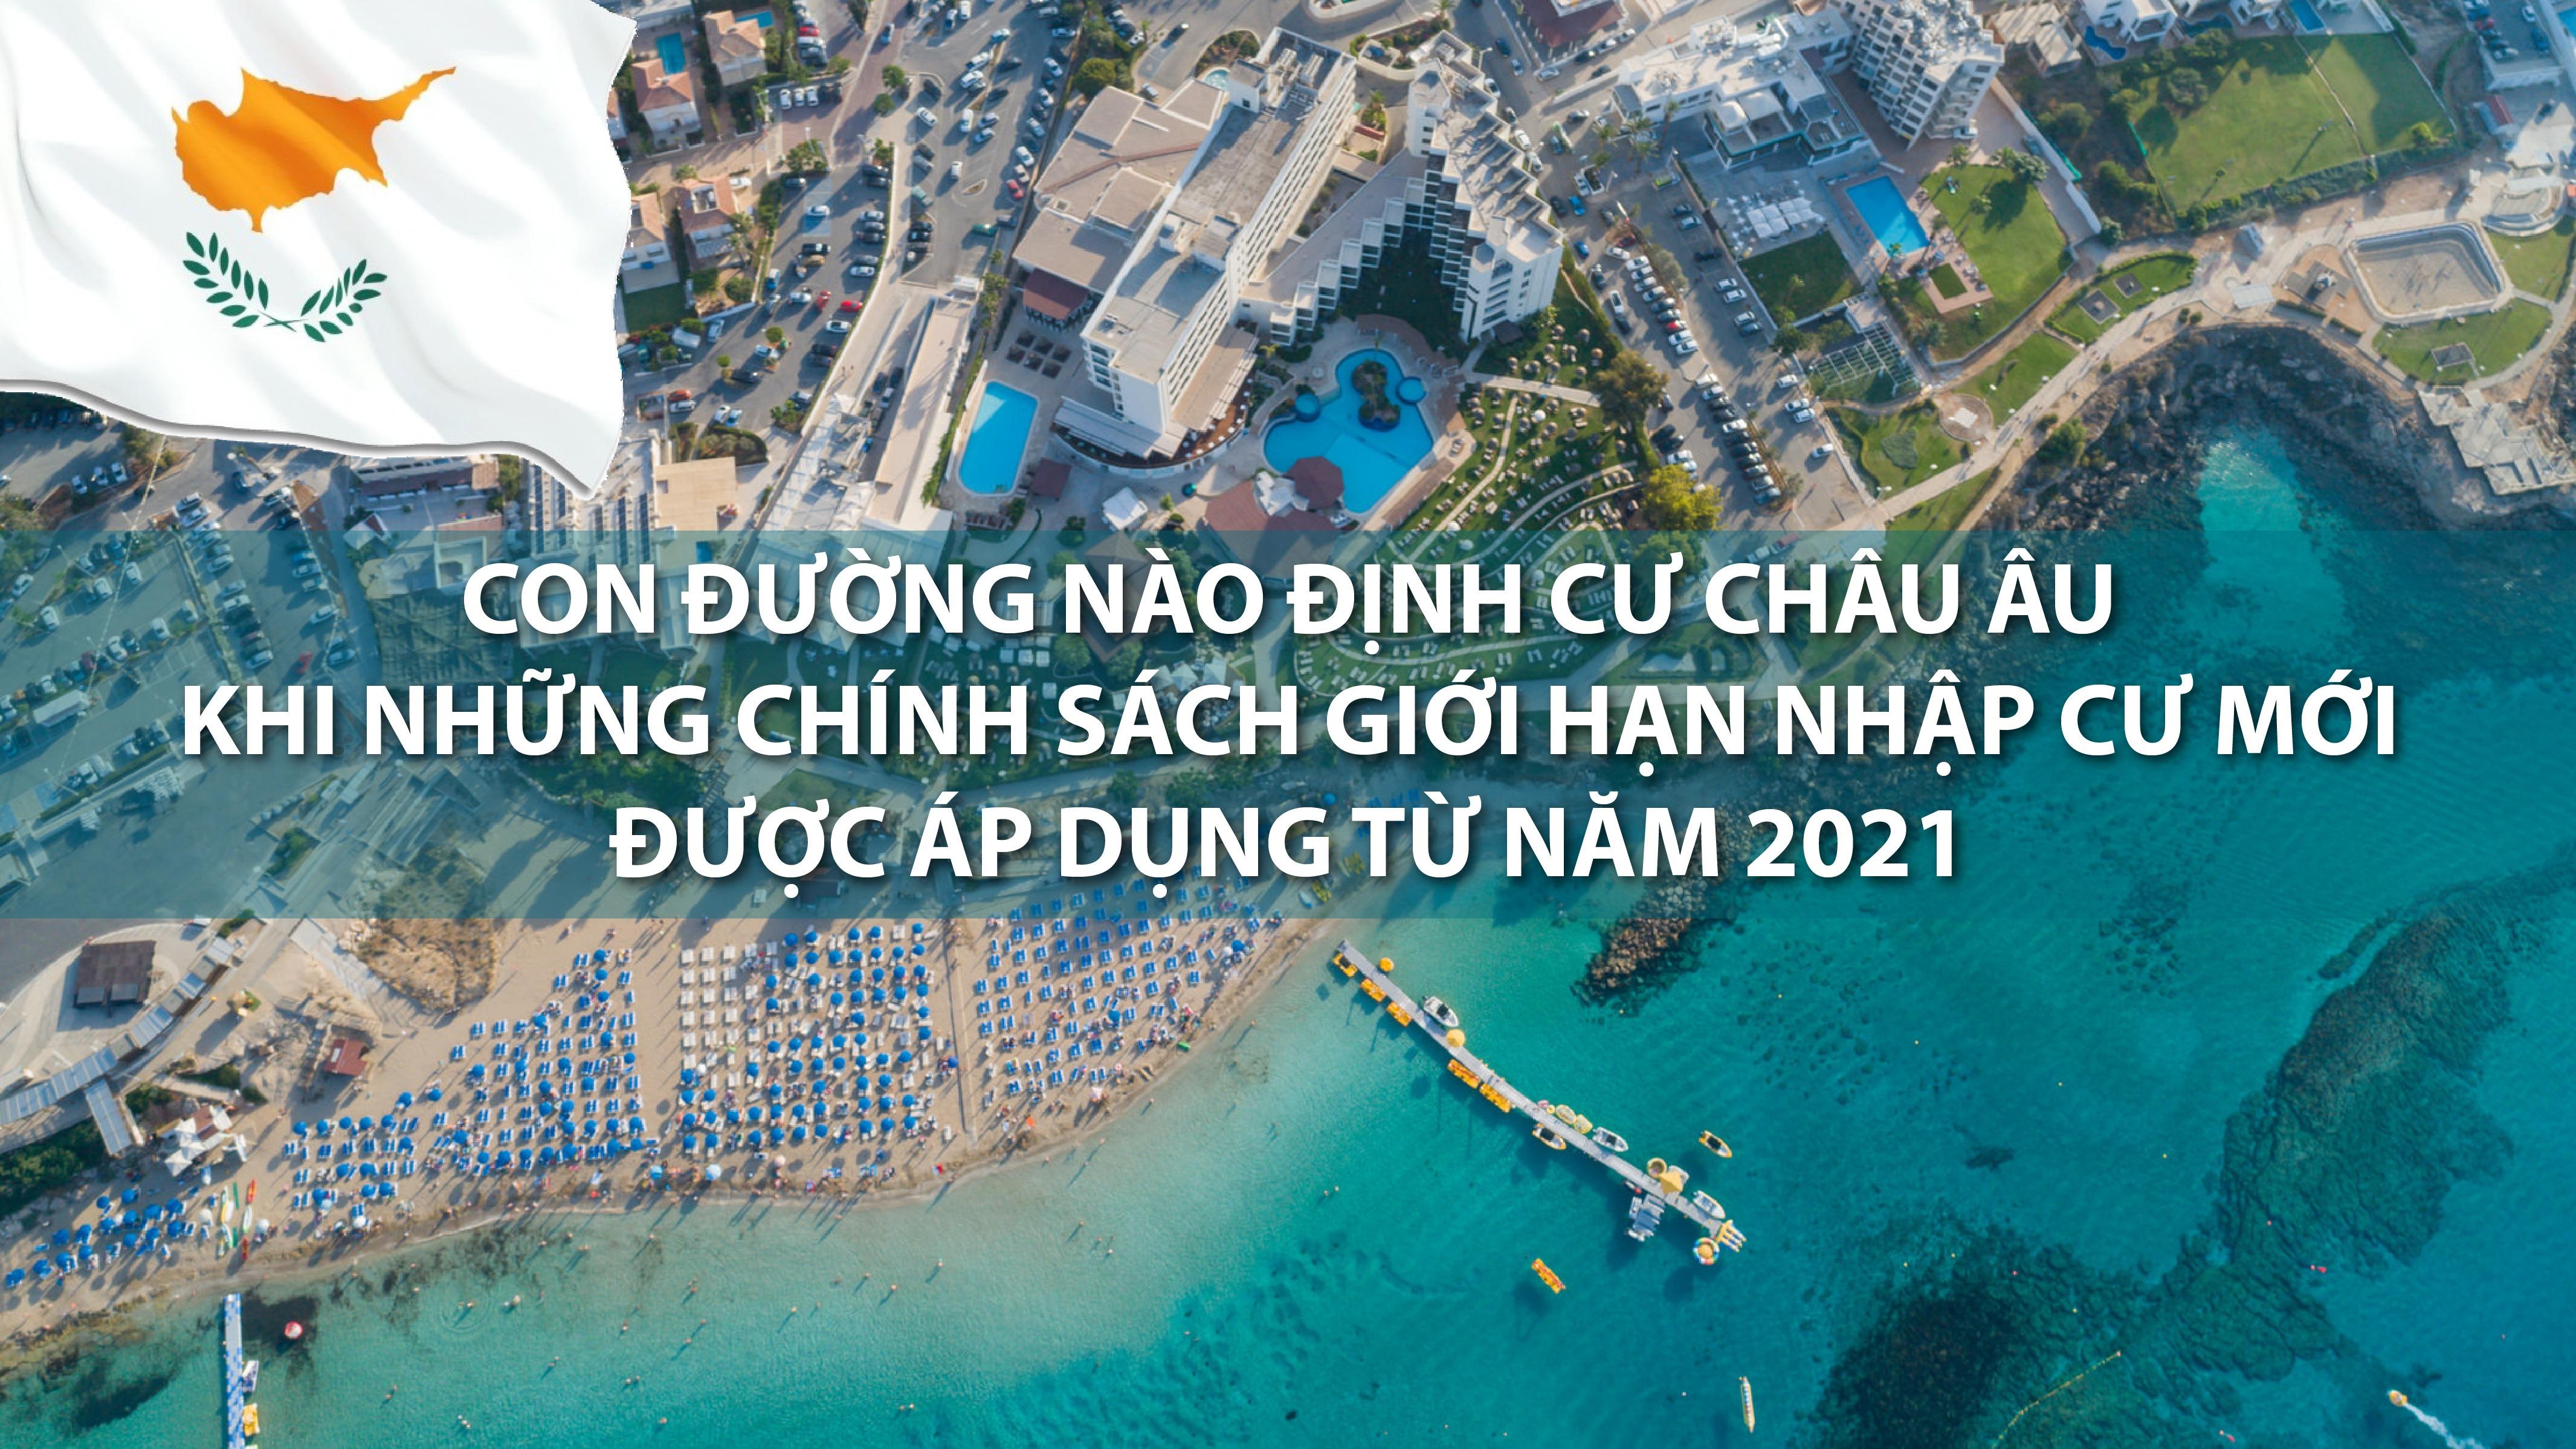 con-duong-nao-dinh-cu-chau-au-khi-nhung-chinh-sach-gioi-han-nhap-cu-moi-duoc-ap-dung-tu-nam-2021